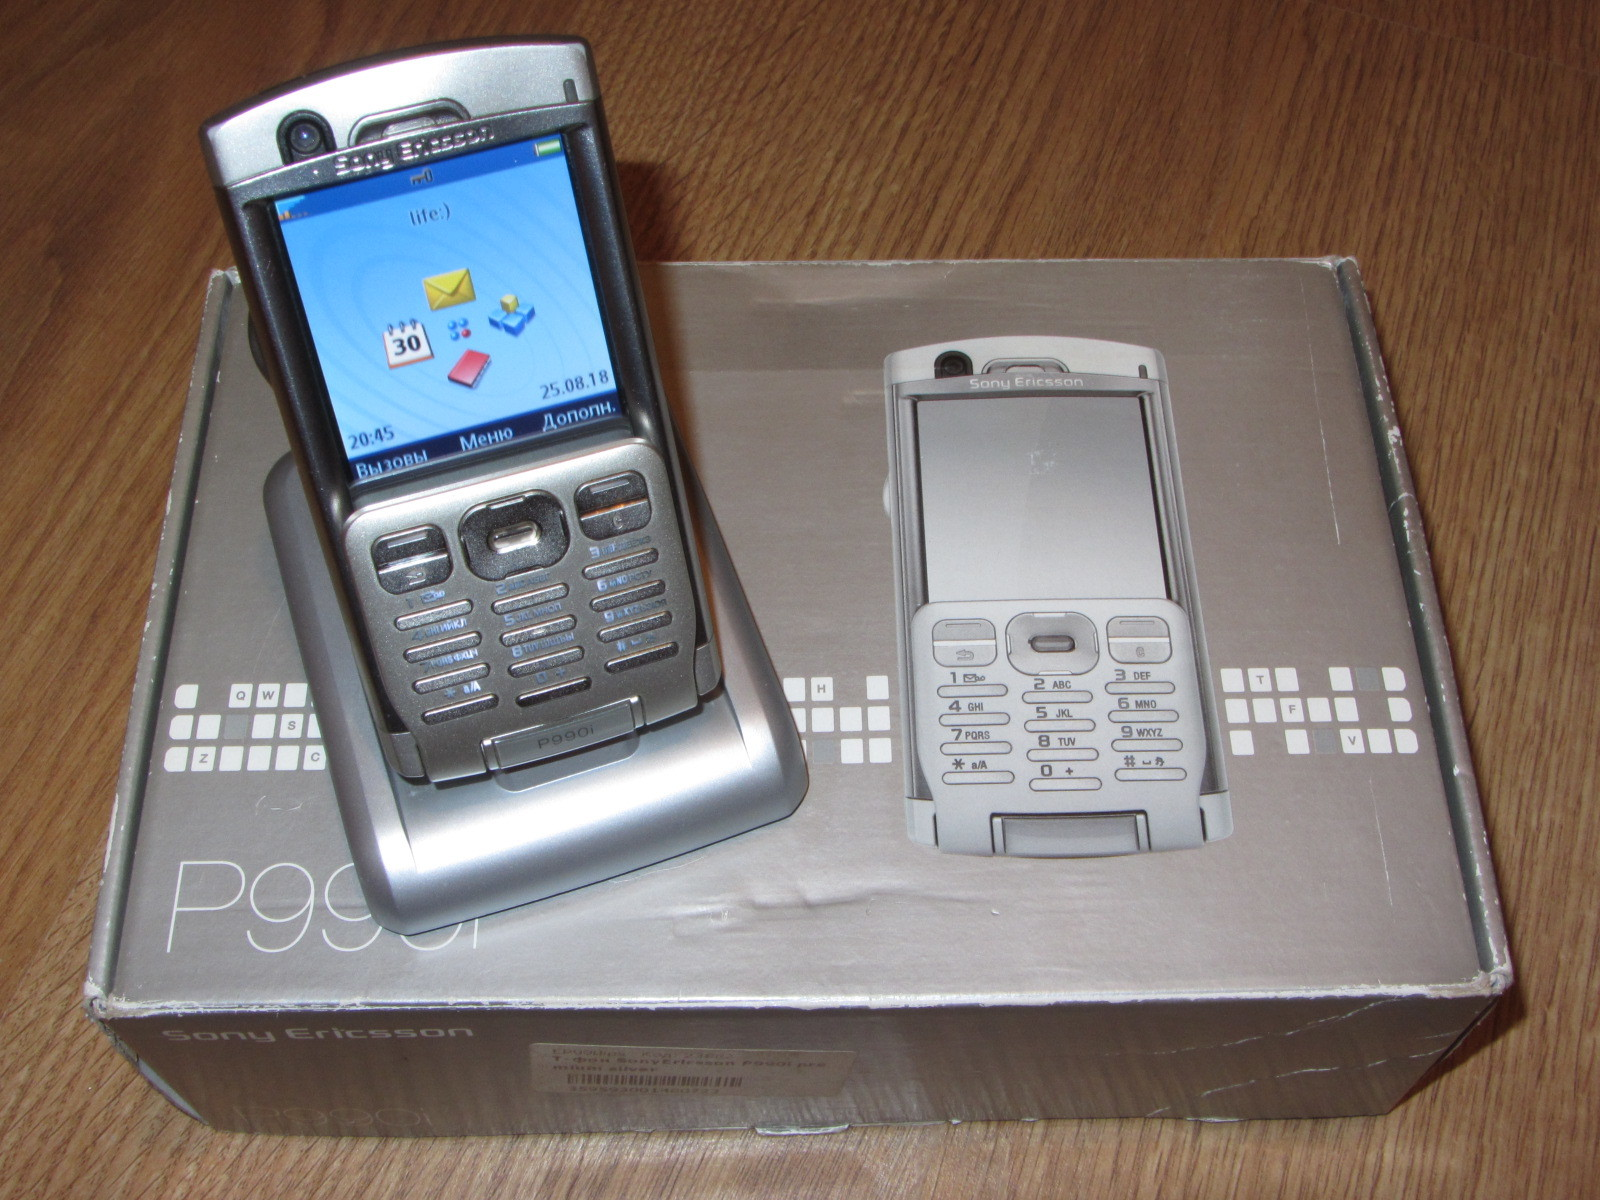 Топовый смартфон из 2005 года! Sony Ericsson P990i Symbian UIQ 3.0 6e8fdd1a7d828